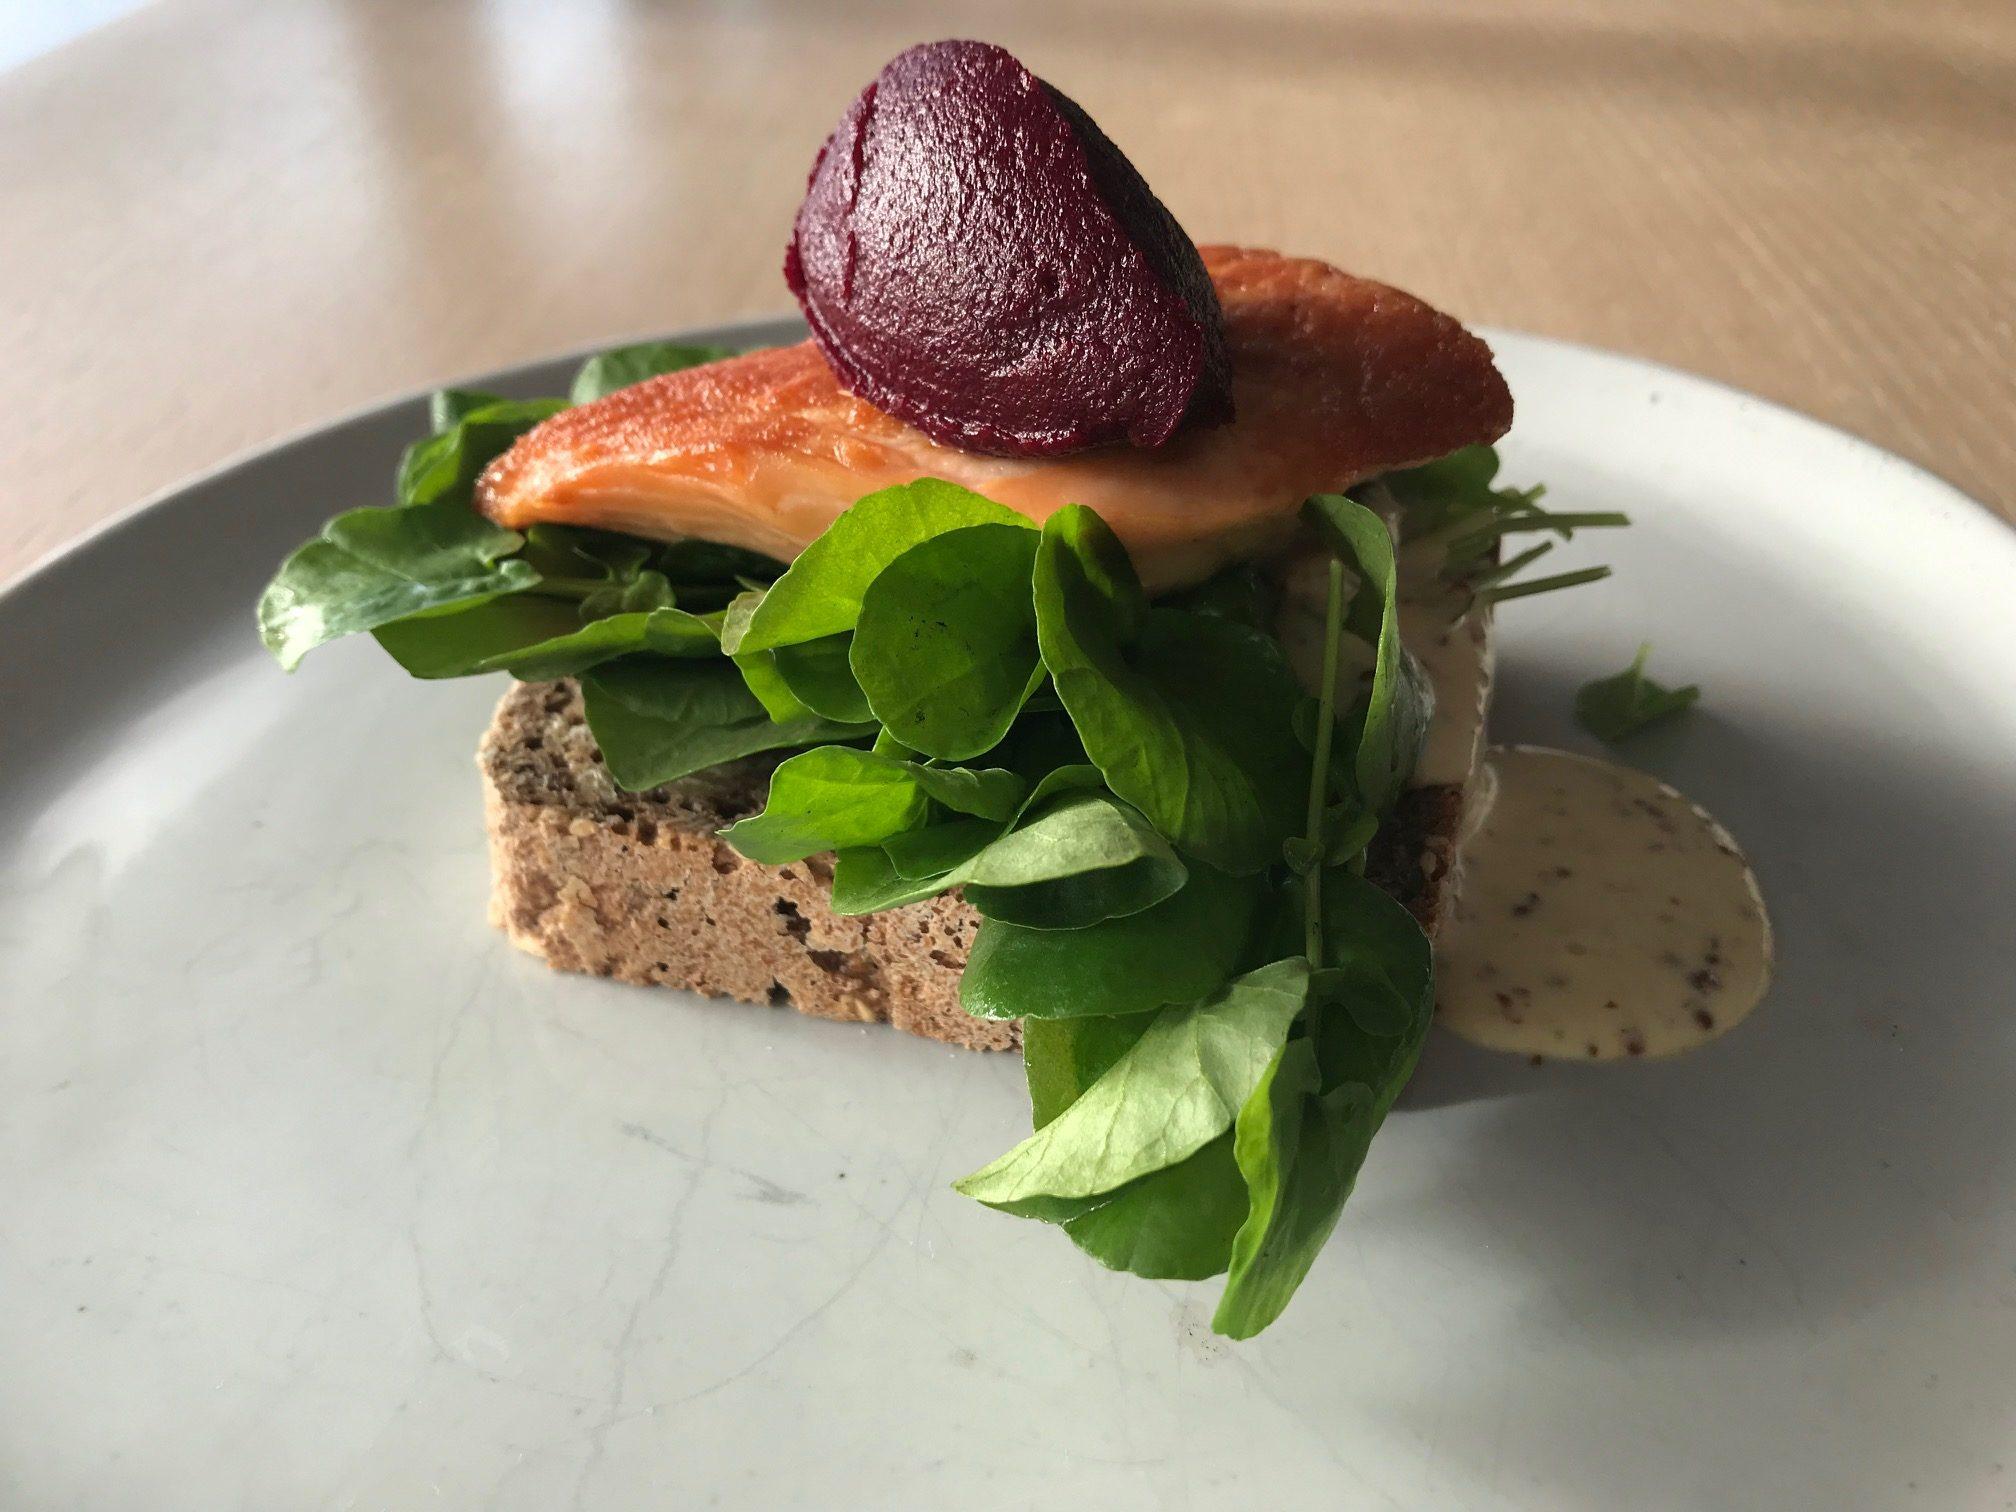 A salmon smörgåsar (open-face sandwich) at FIKA Cafe